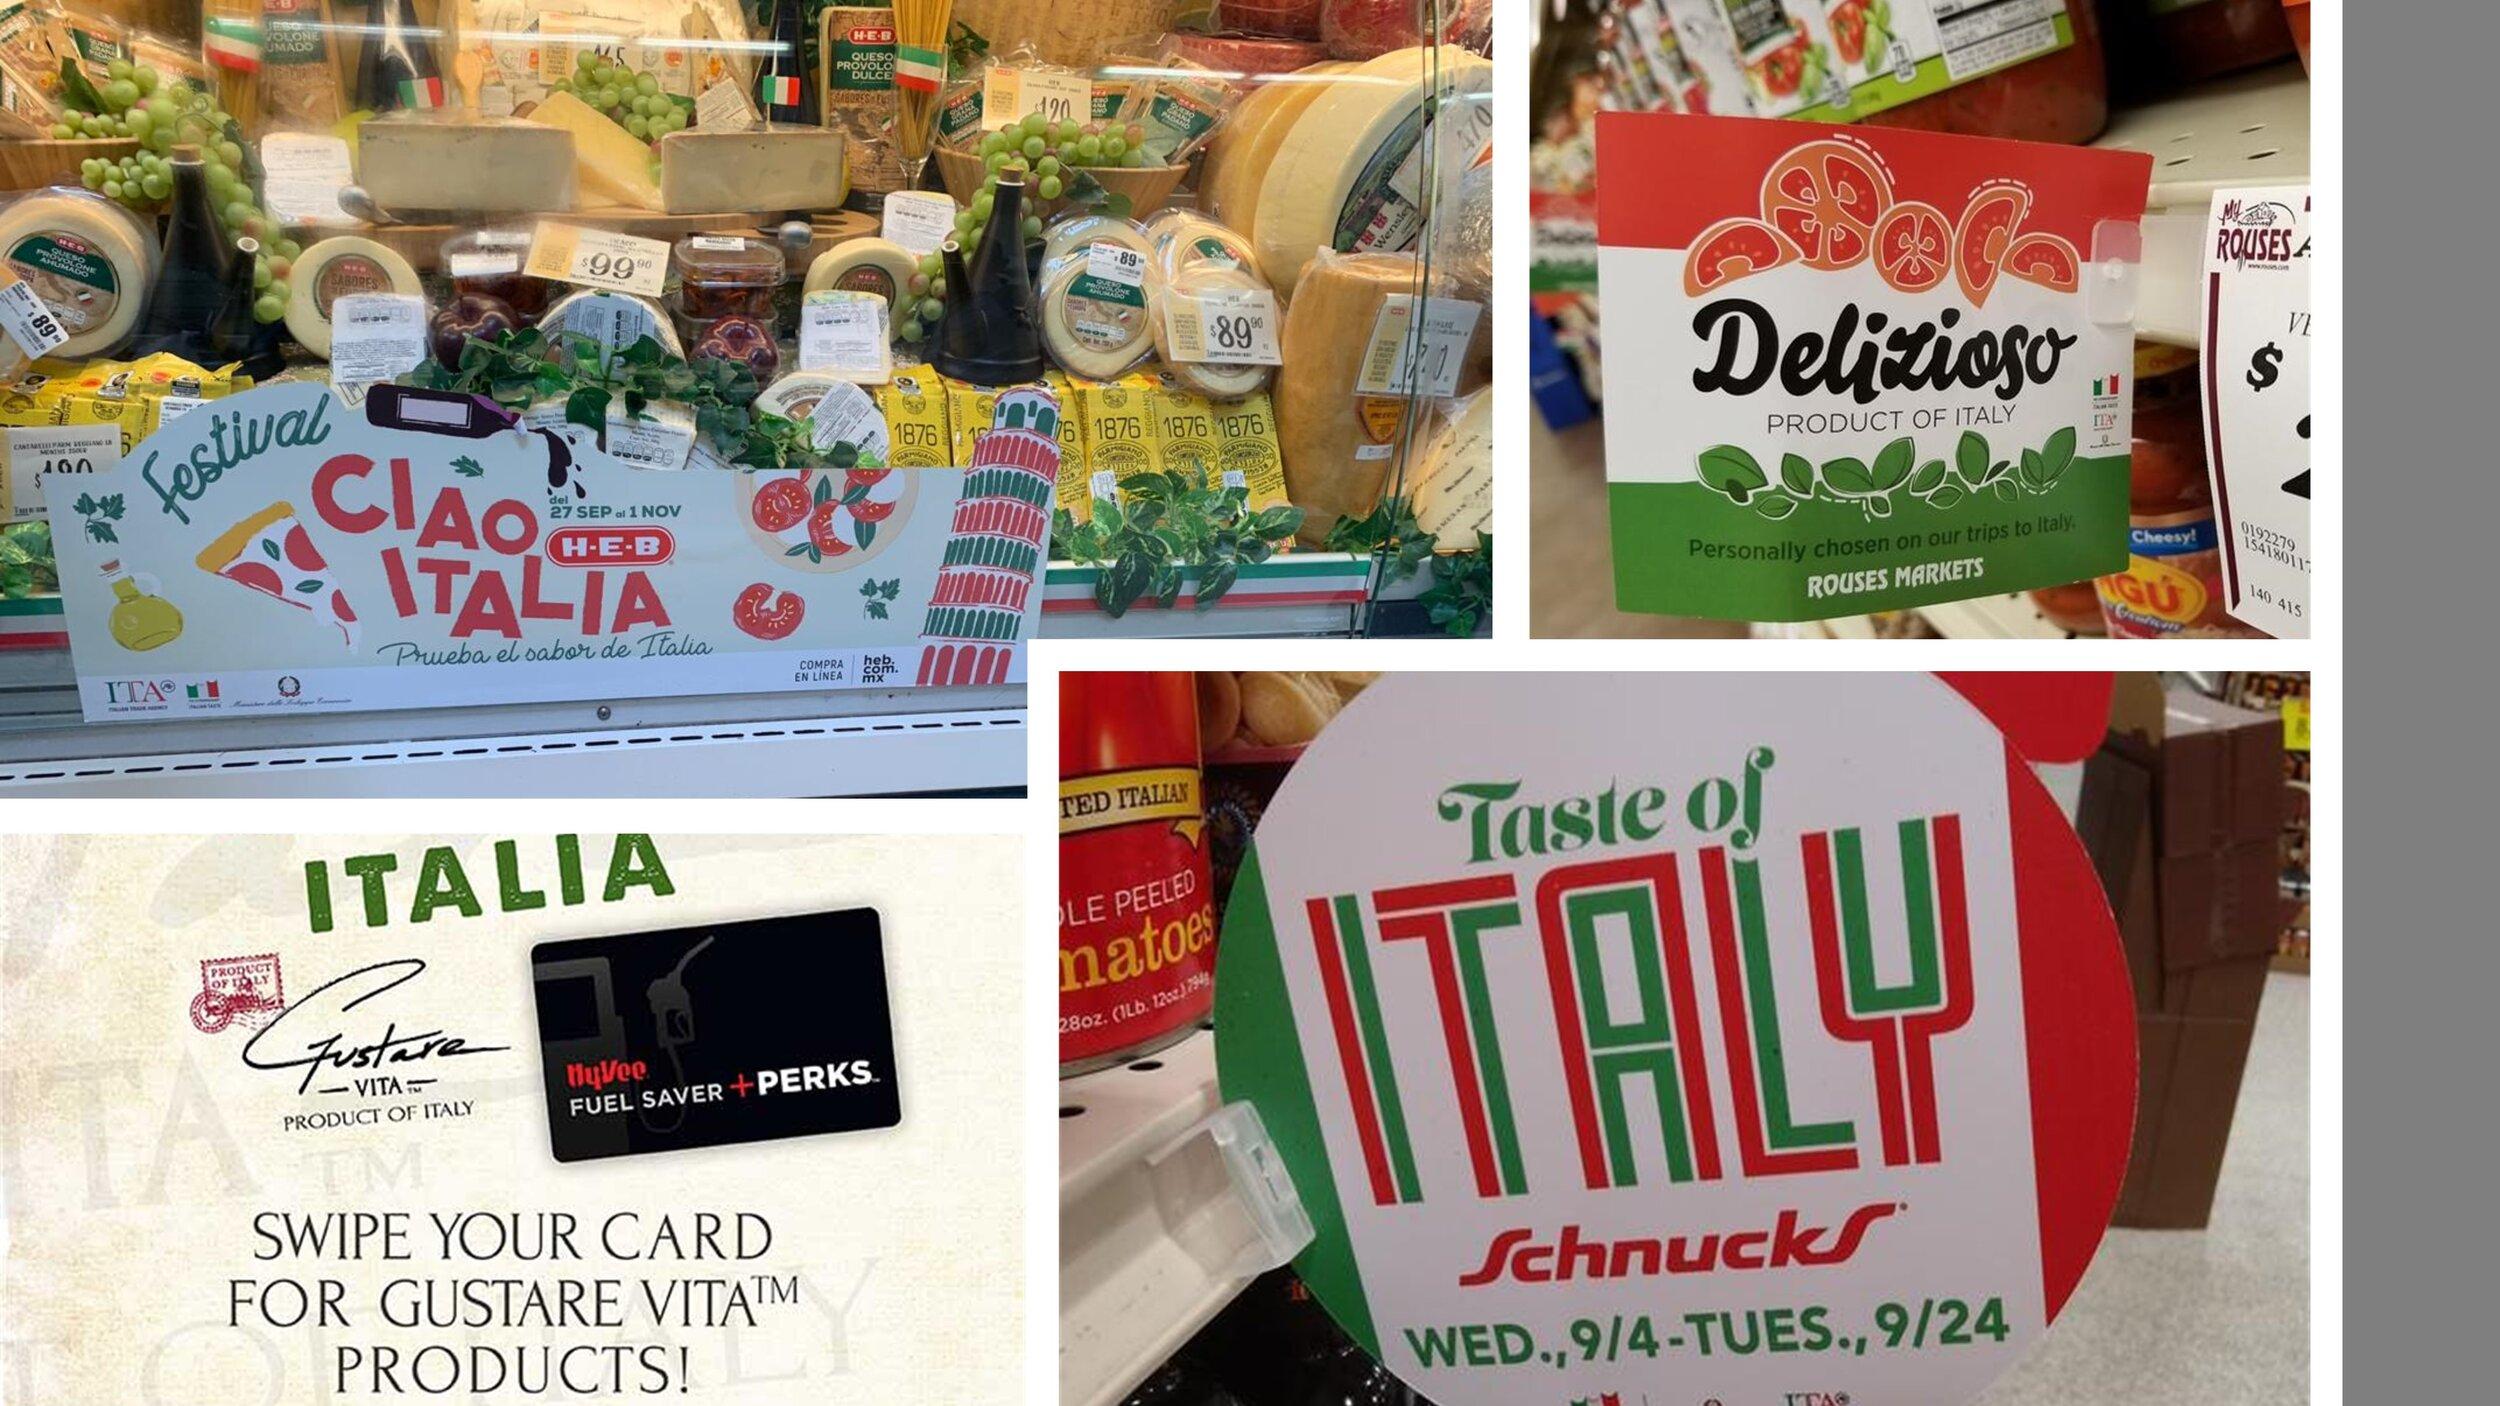 THE EXTRAORDINARY ITALIAN TASTE PROMOTIONS -